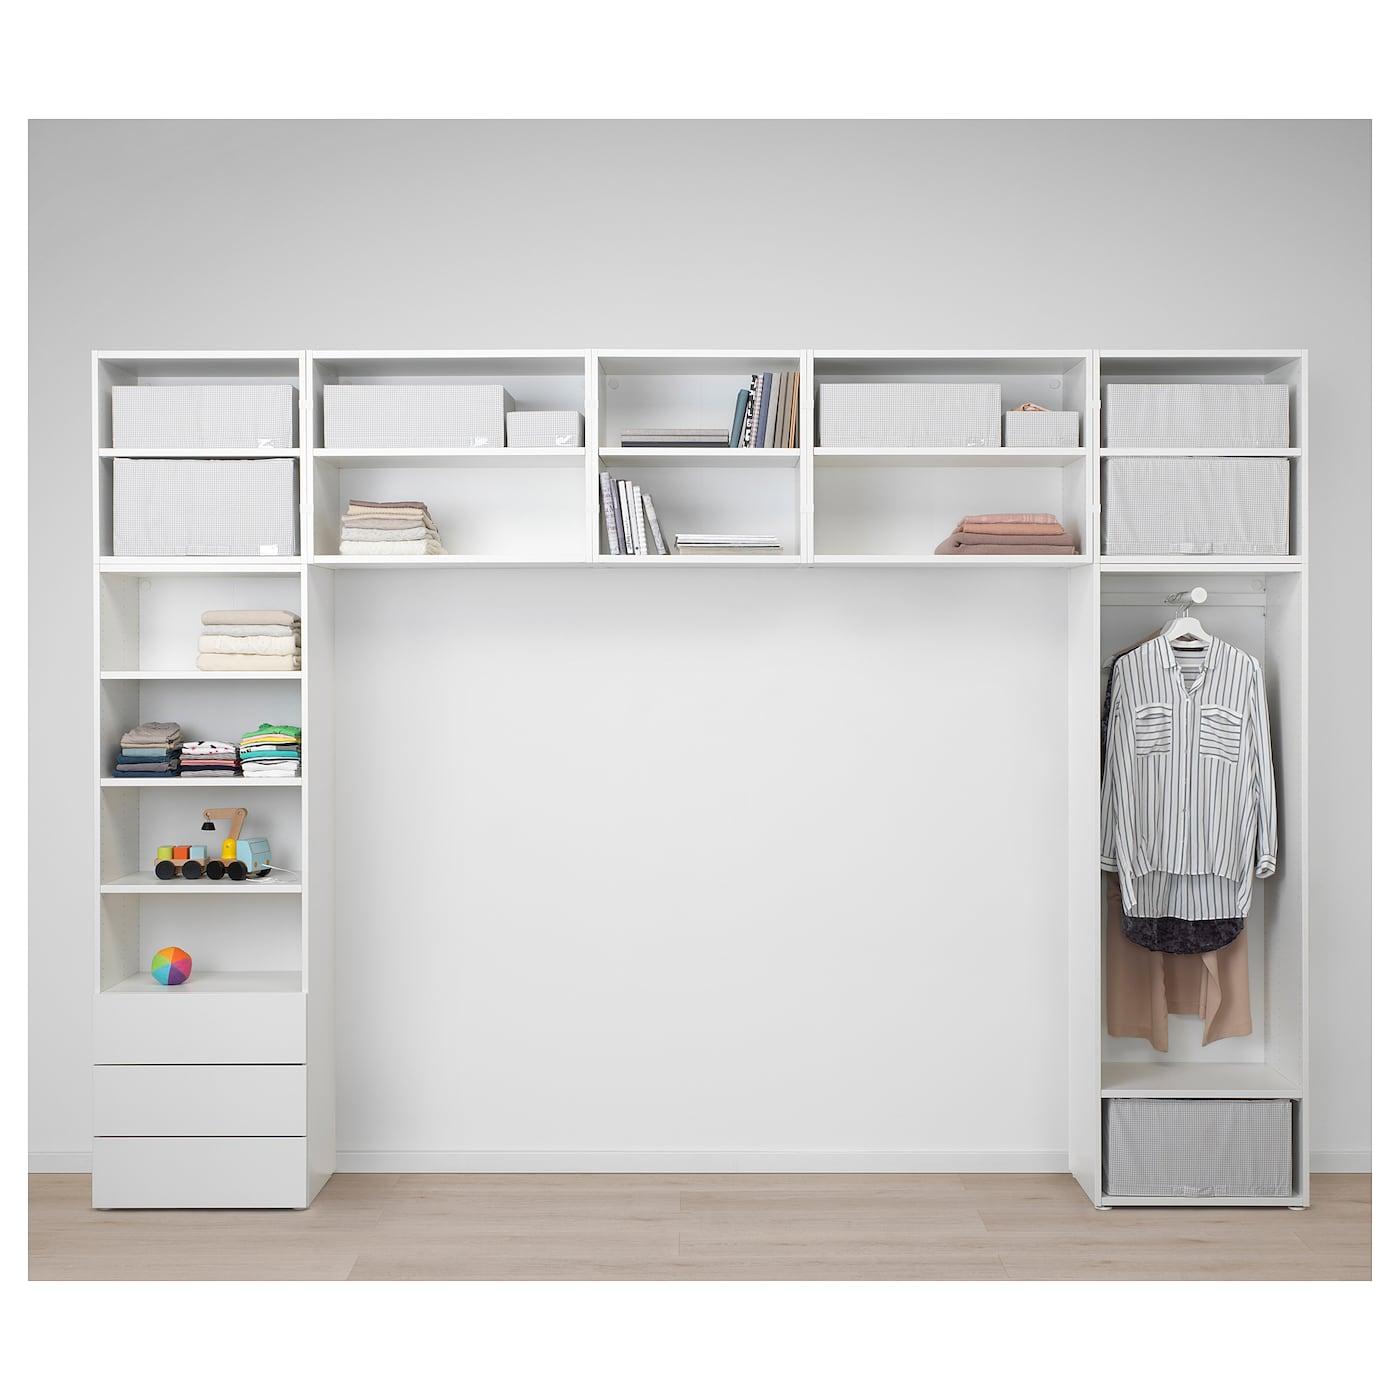 platsa kledingkast wit fonnes sannidal 340 x 42 x 241 cm ikea. Black Bedroom Furniture Sets. Home Design Ideas